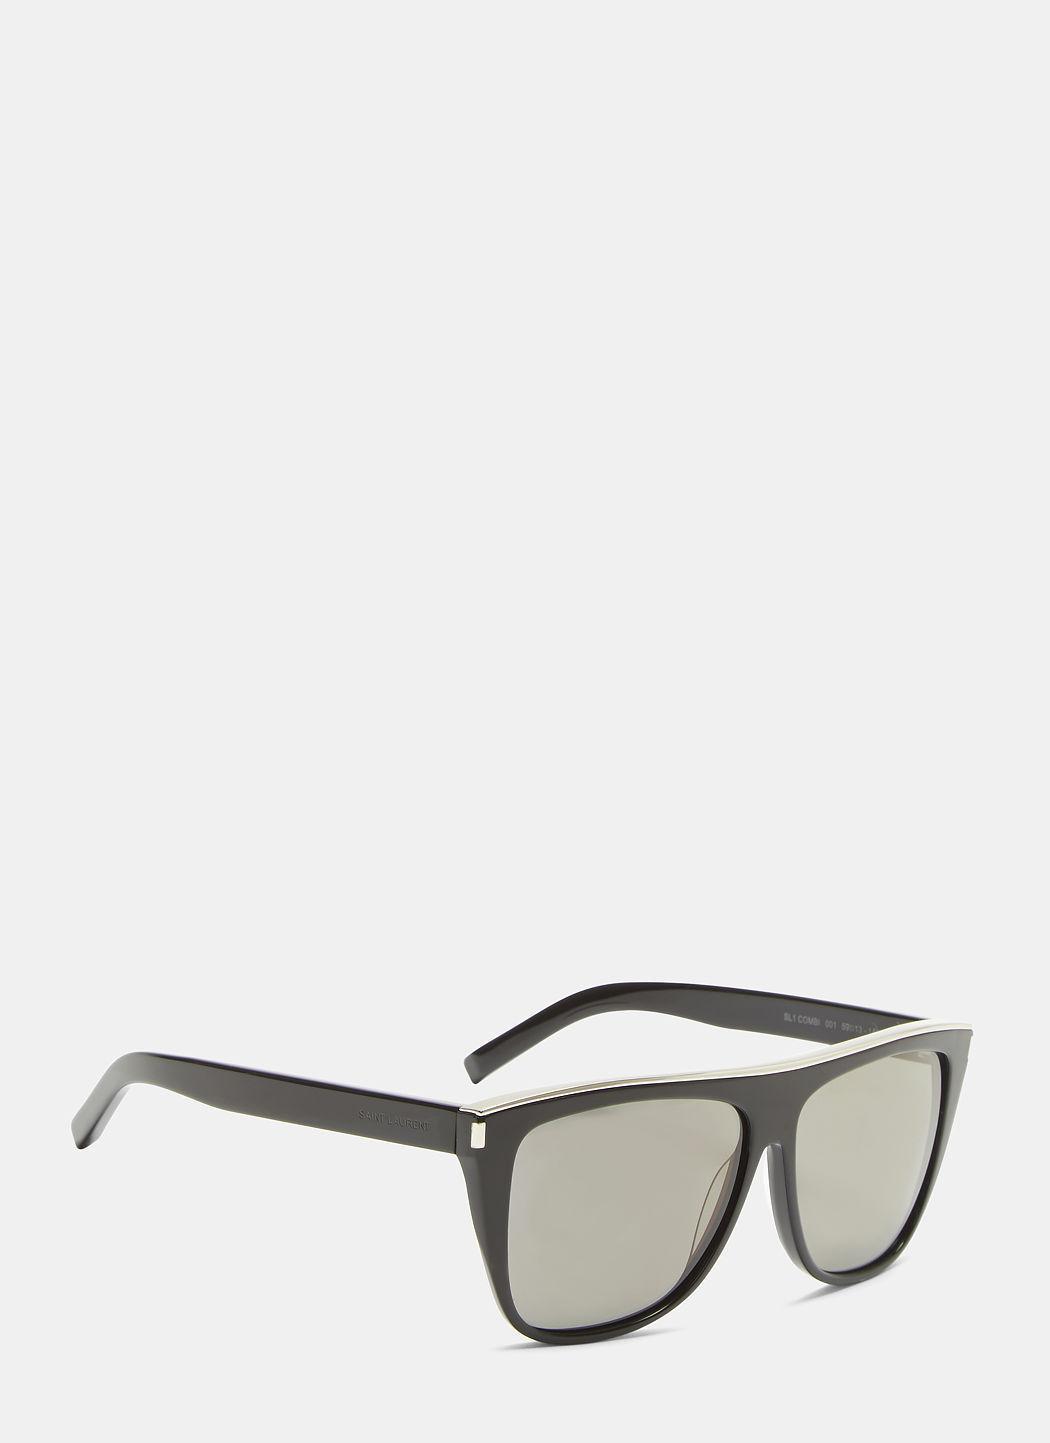 0f4621f8d405 Saint Laurent New Wave Sl 1 Sunglasses In Black   ModeSens